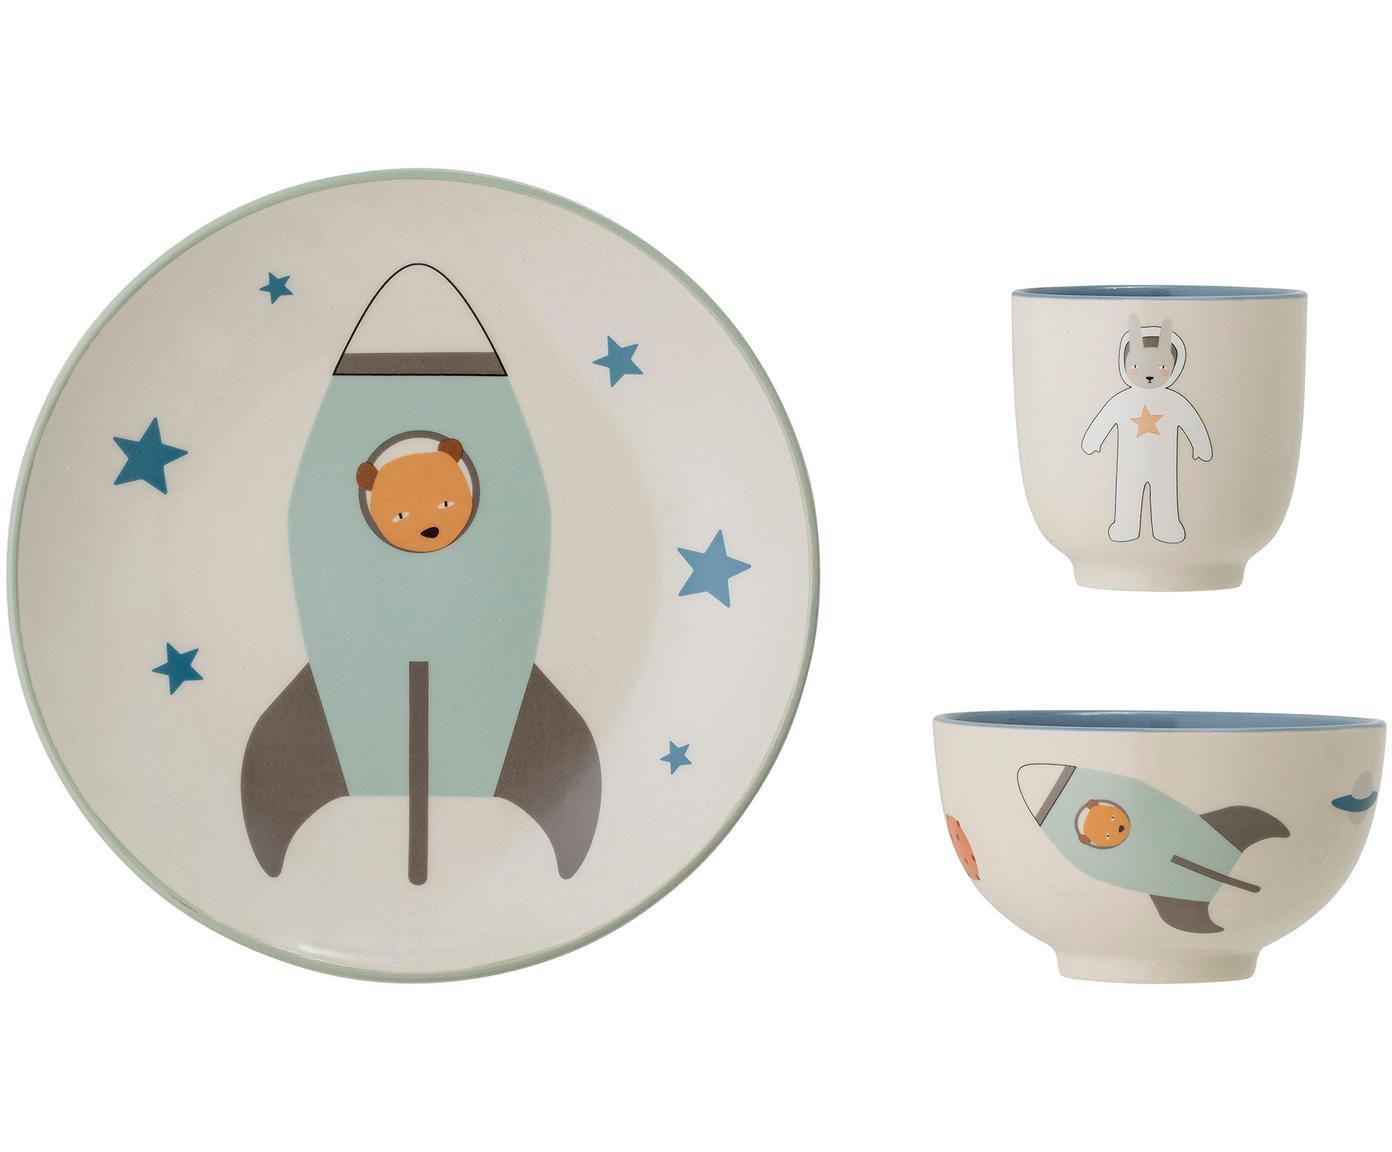 Set stoviglie Space 3 pz, Terracotta, Bianco latteo, multicolore, Set in varie misure